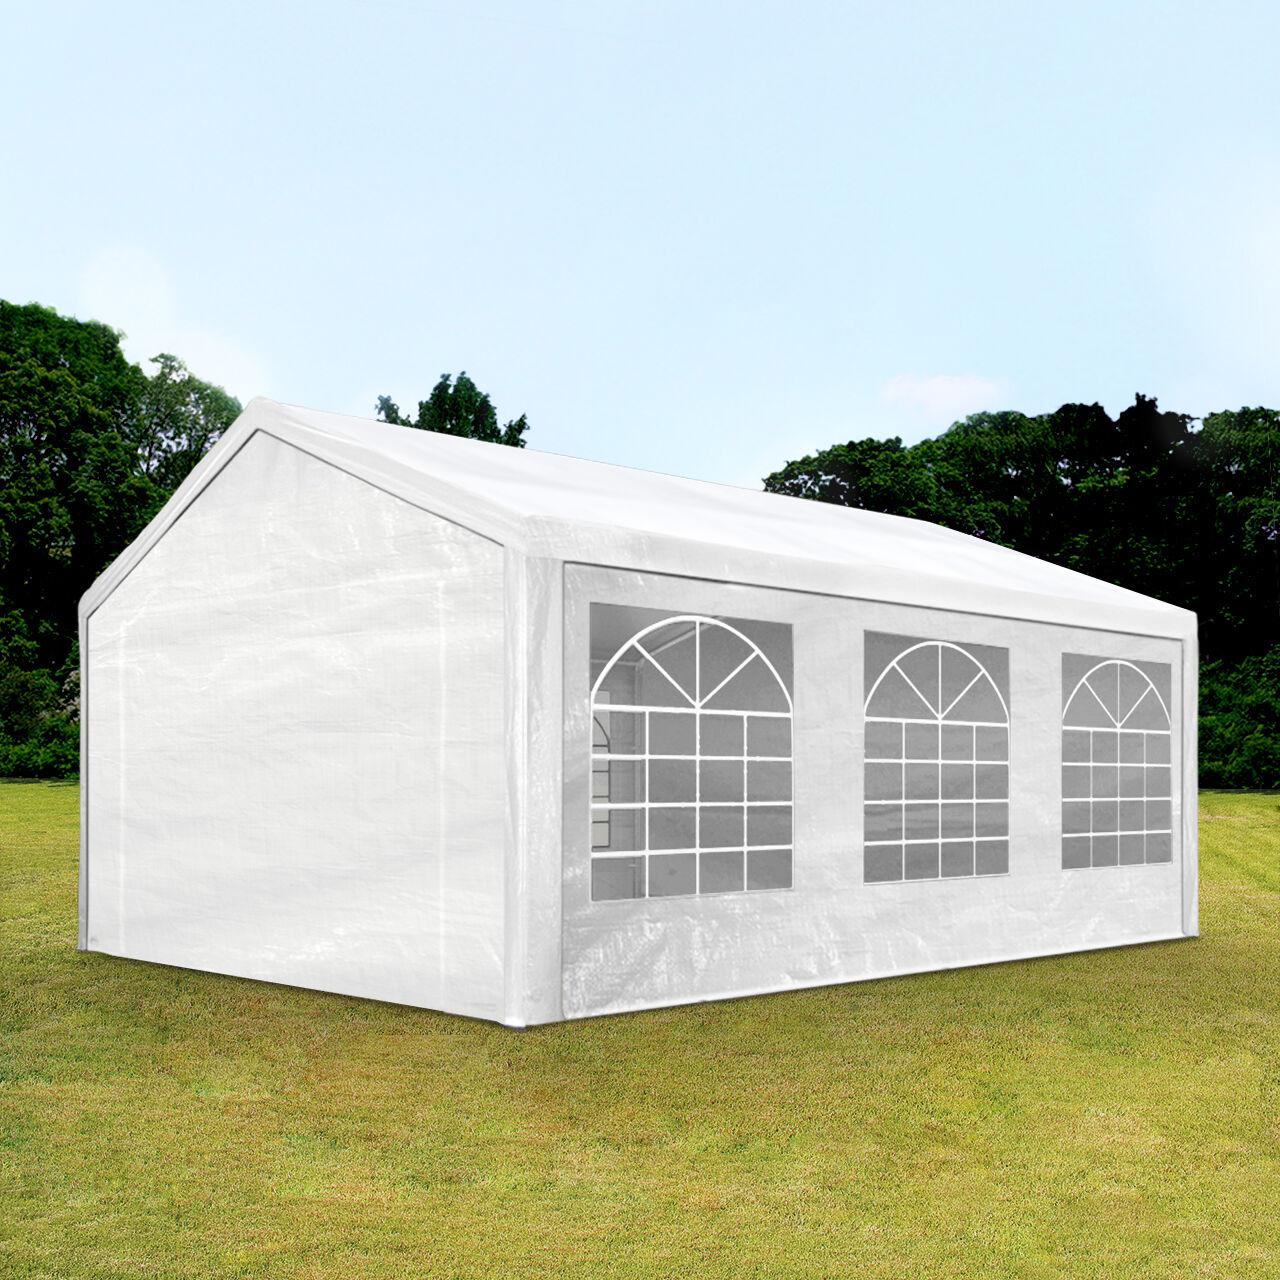 TOOLPORT Marquee 4x6m PE 180g/m² white waterproof